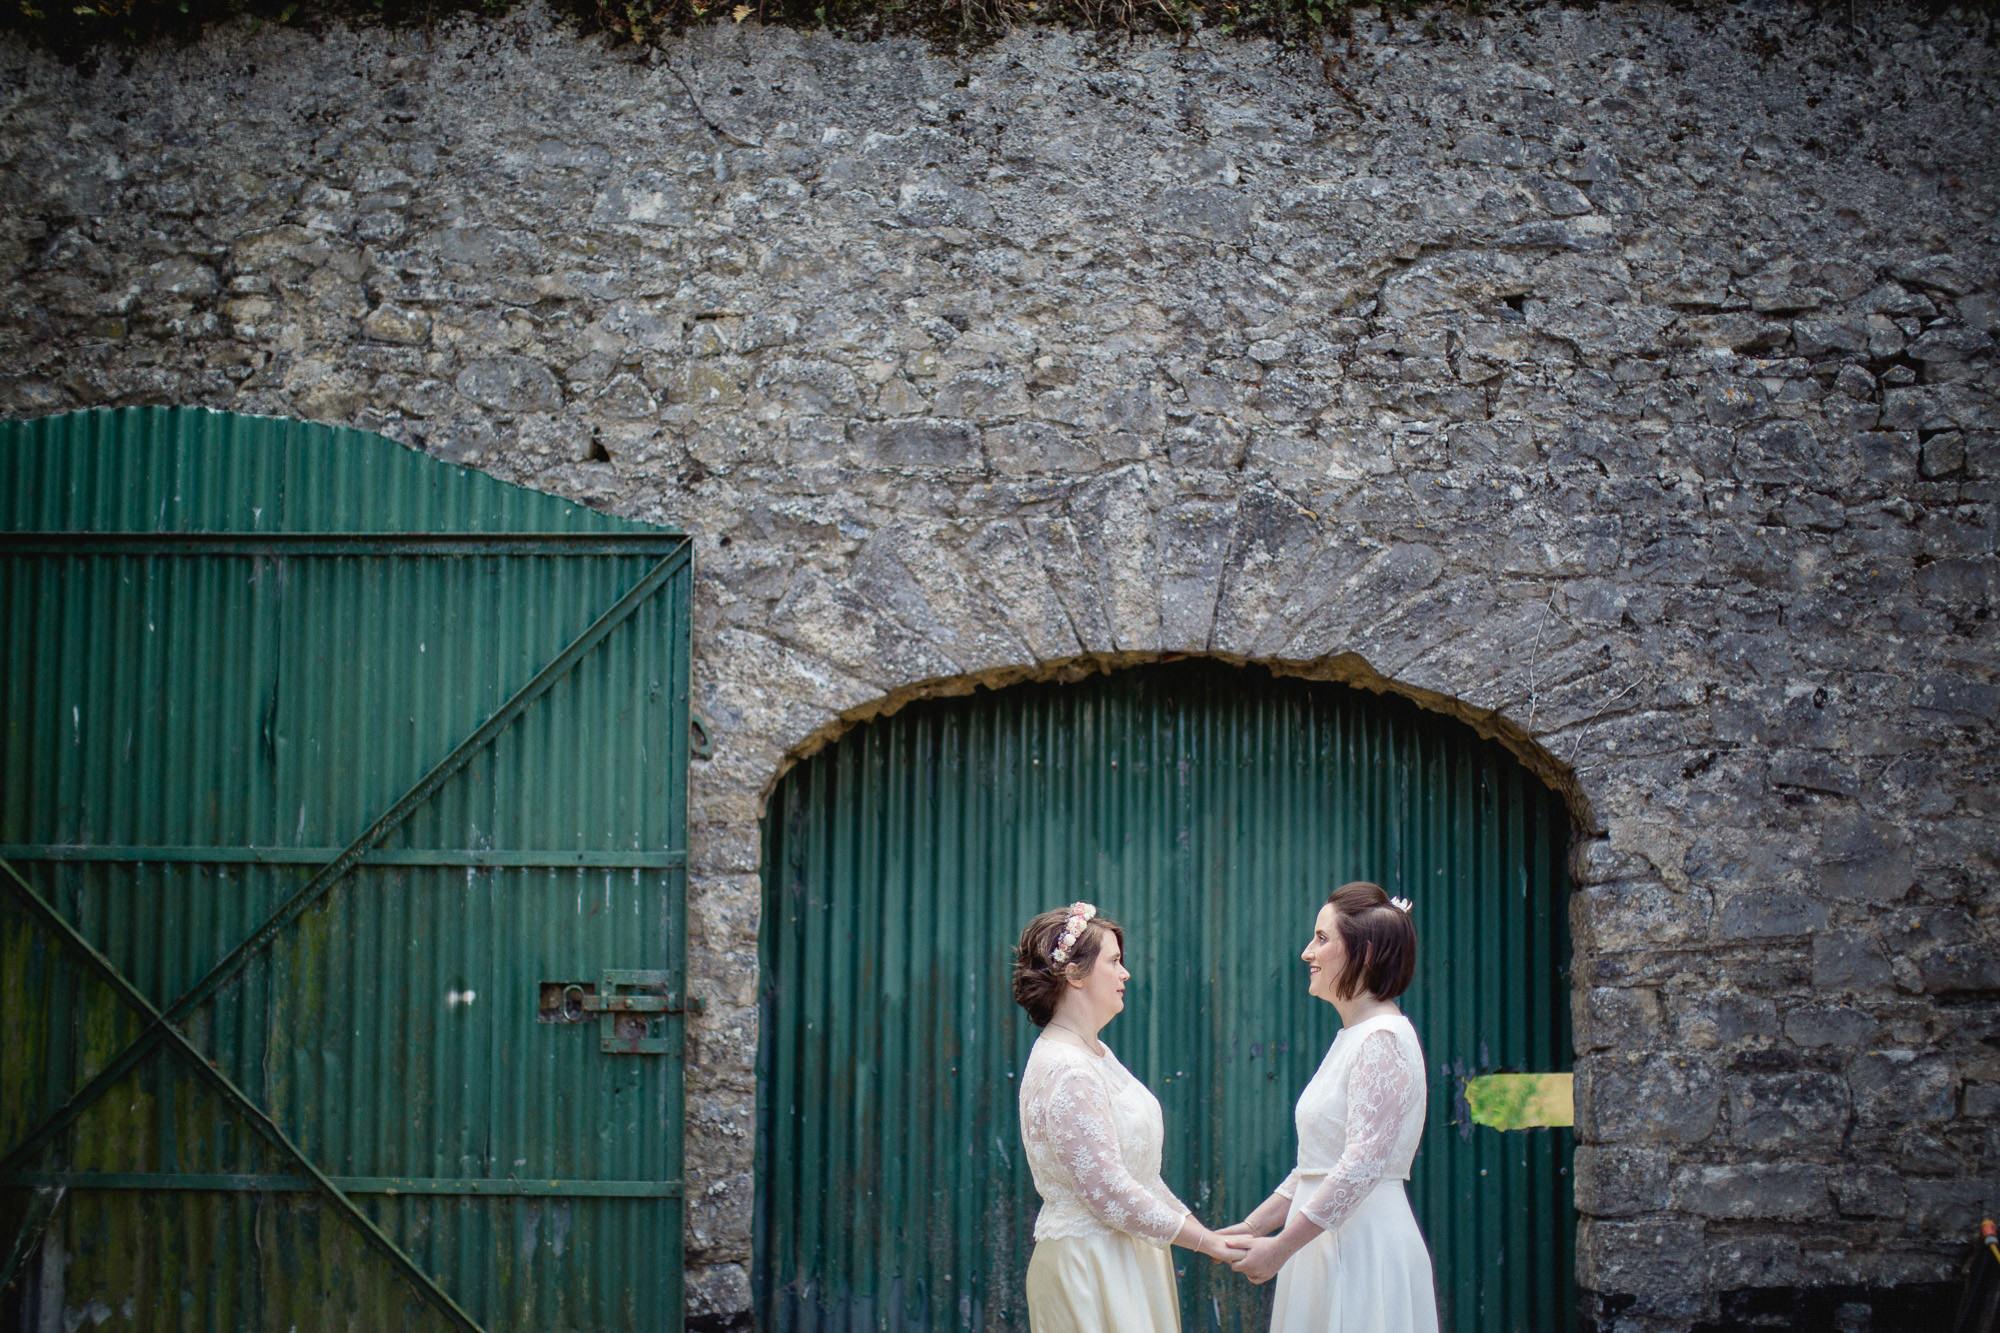 CLAIREBYRNEPHOTOGRAPHY-WEDDING-Ireland-cloncody-alternative-fun-Jen-Helena-16.jpg